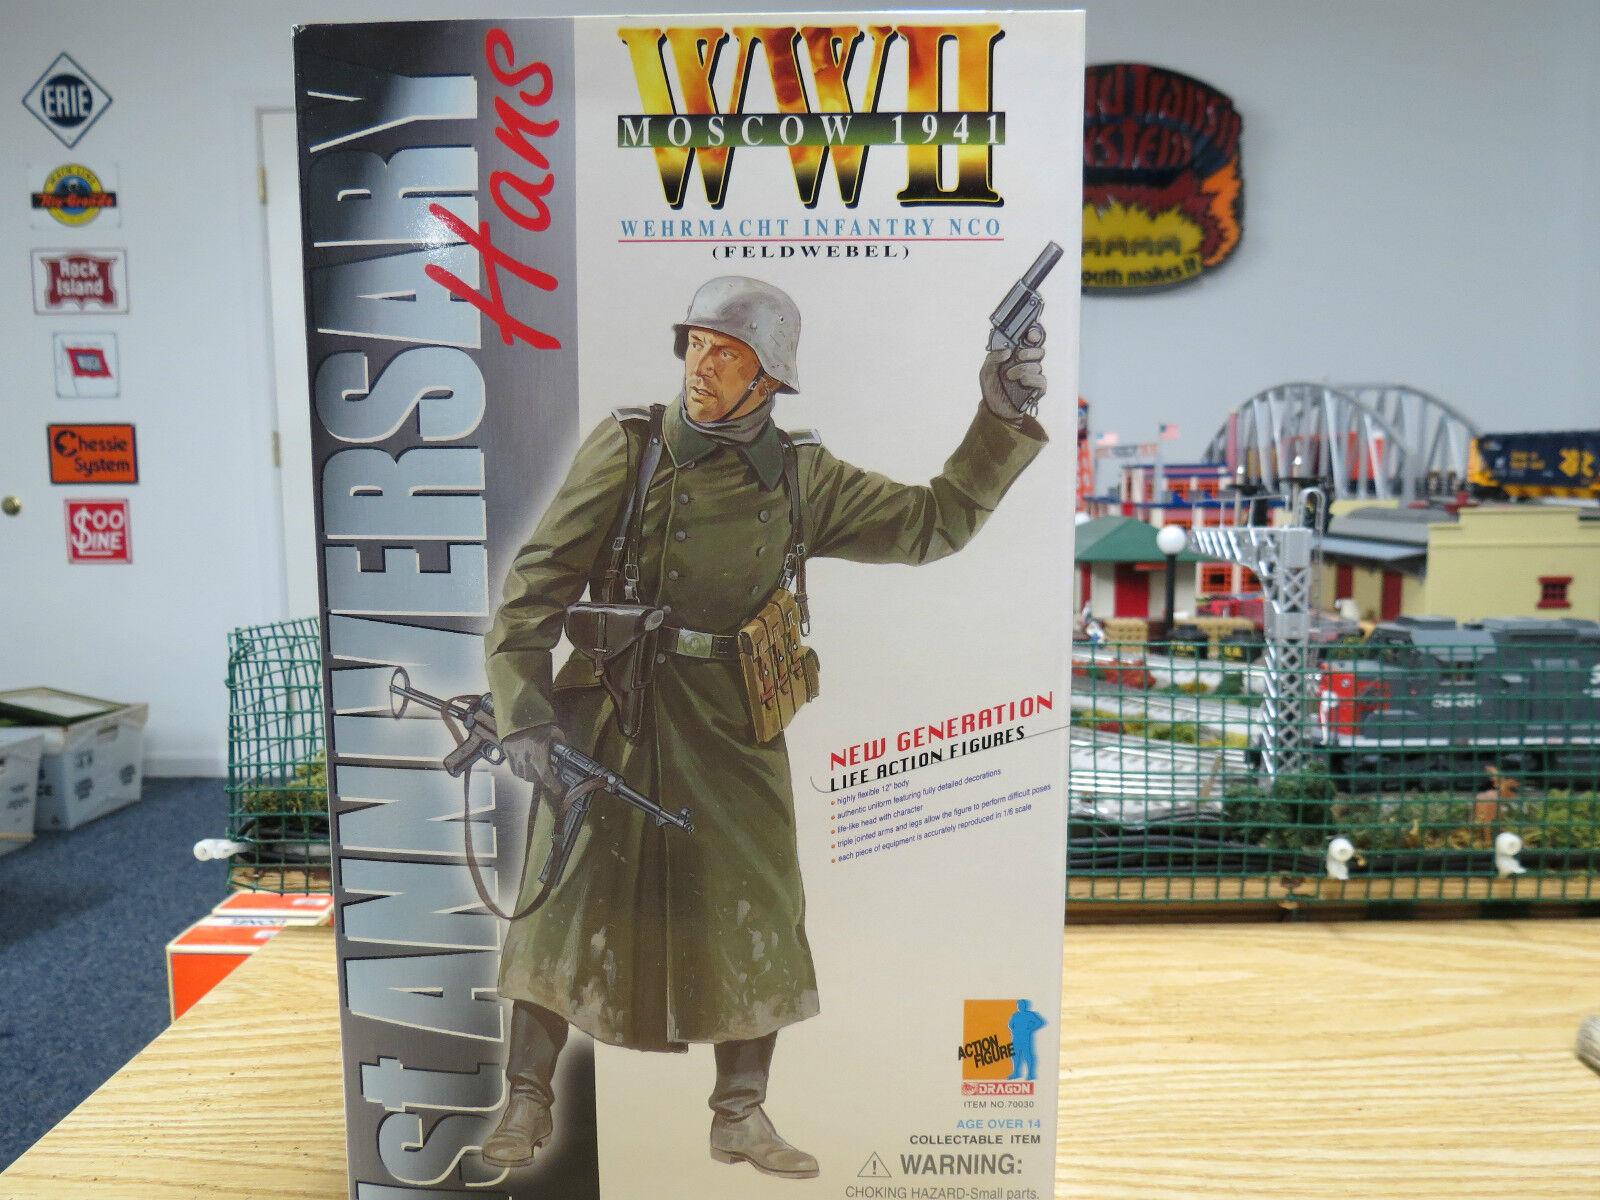 Dragon Rare WW II Moscow  1941 Wehrmacht Infantry NCO   Hans  ,  Mint Condition  vendita di fama mondiale online